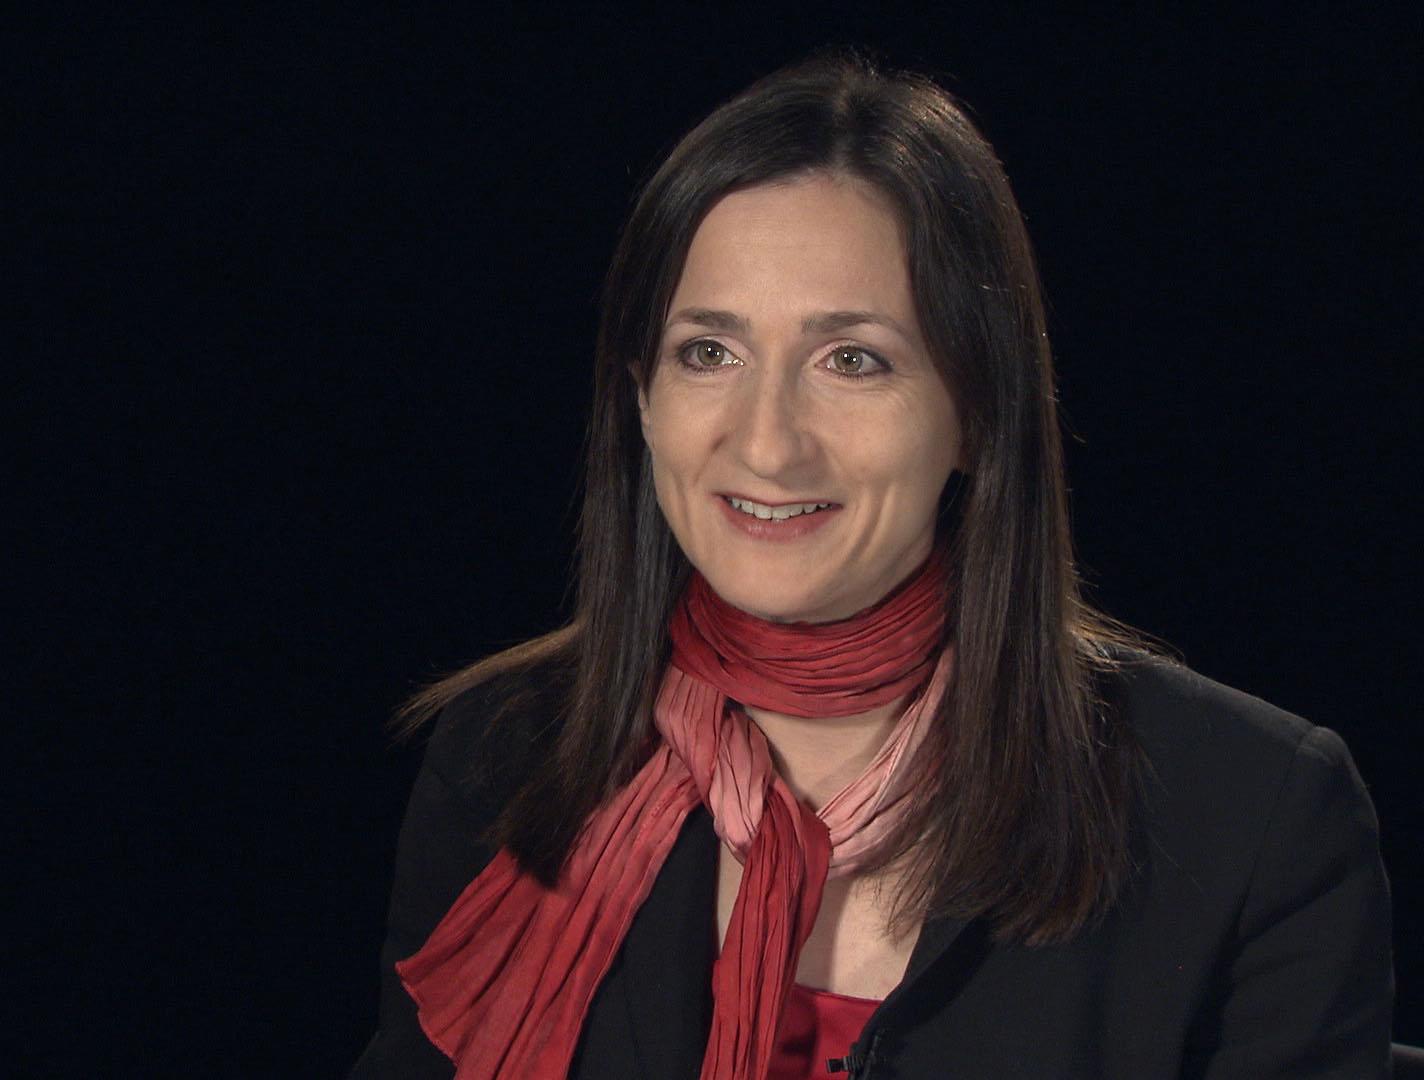 Professor Sara Seager